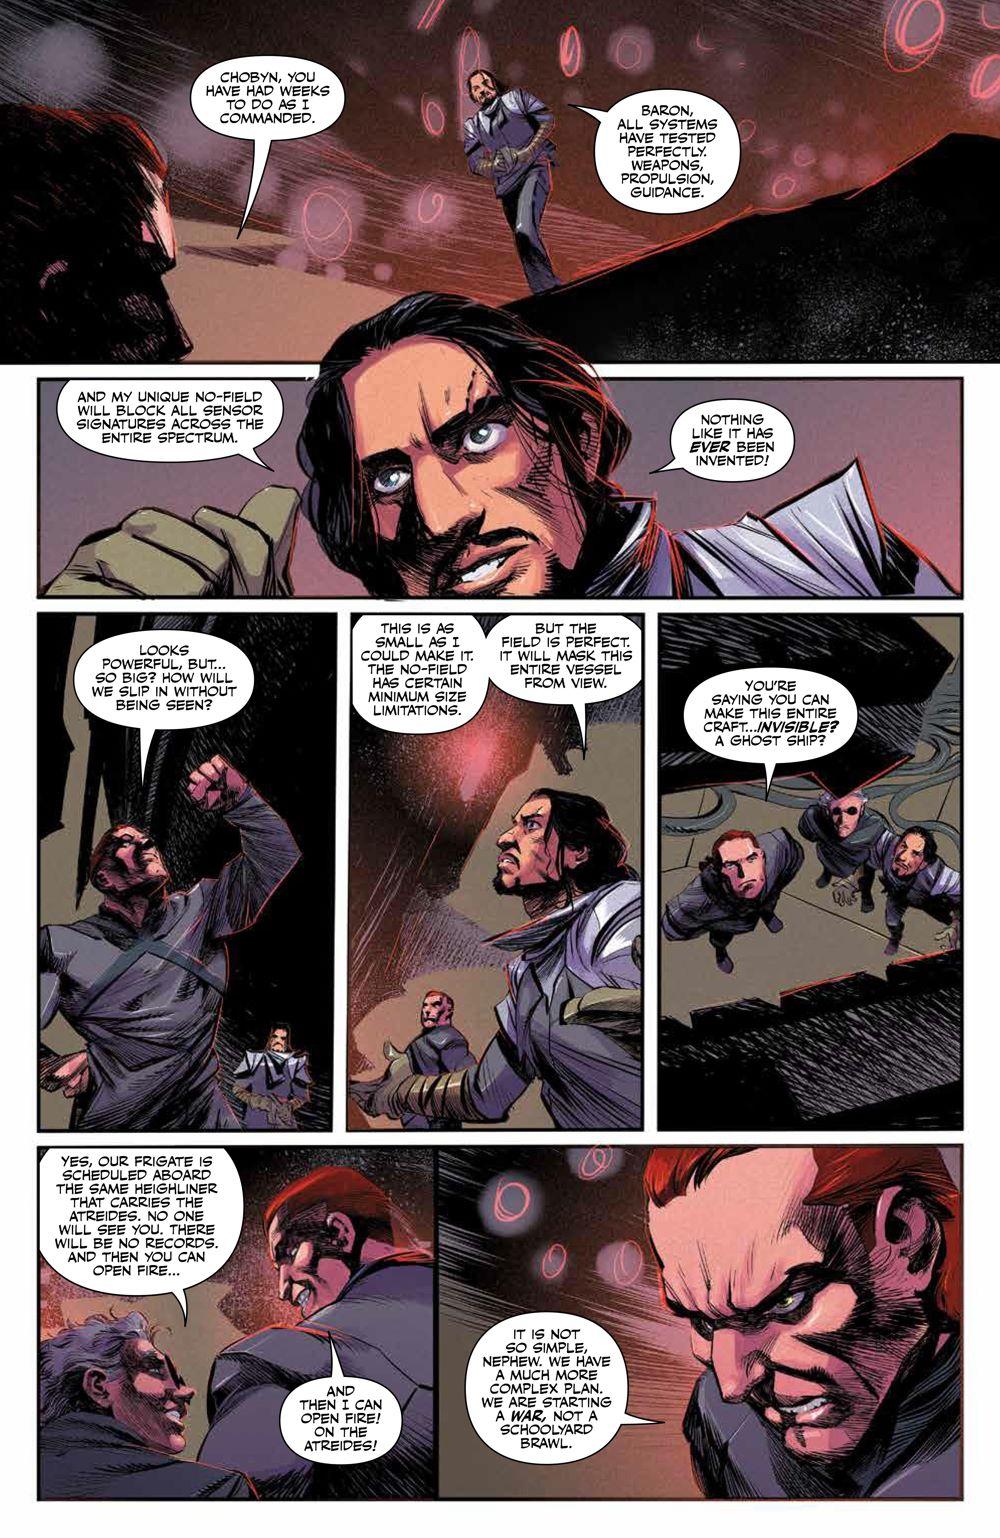 Dune_HouseAtreides_010_PRESS_8 ComicList Previews: DUNE HOUSE ATREIDES #10 (OF 12)